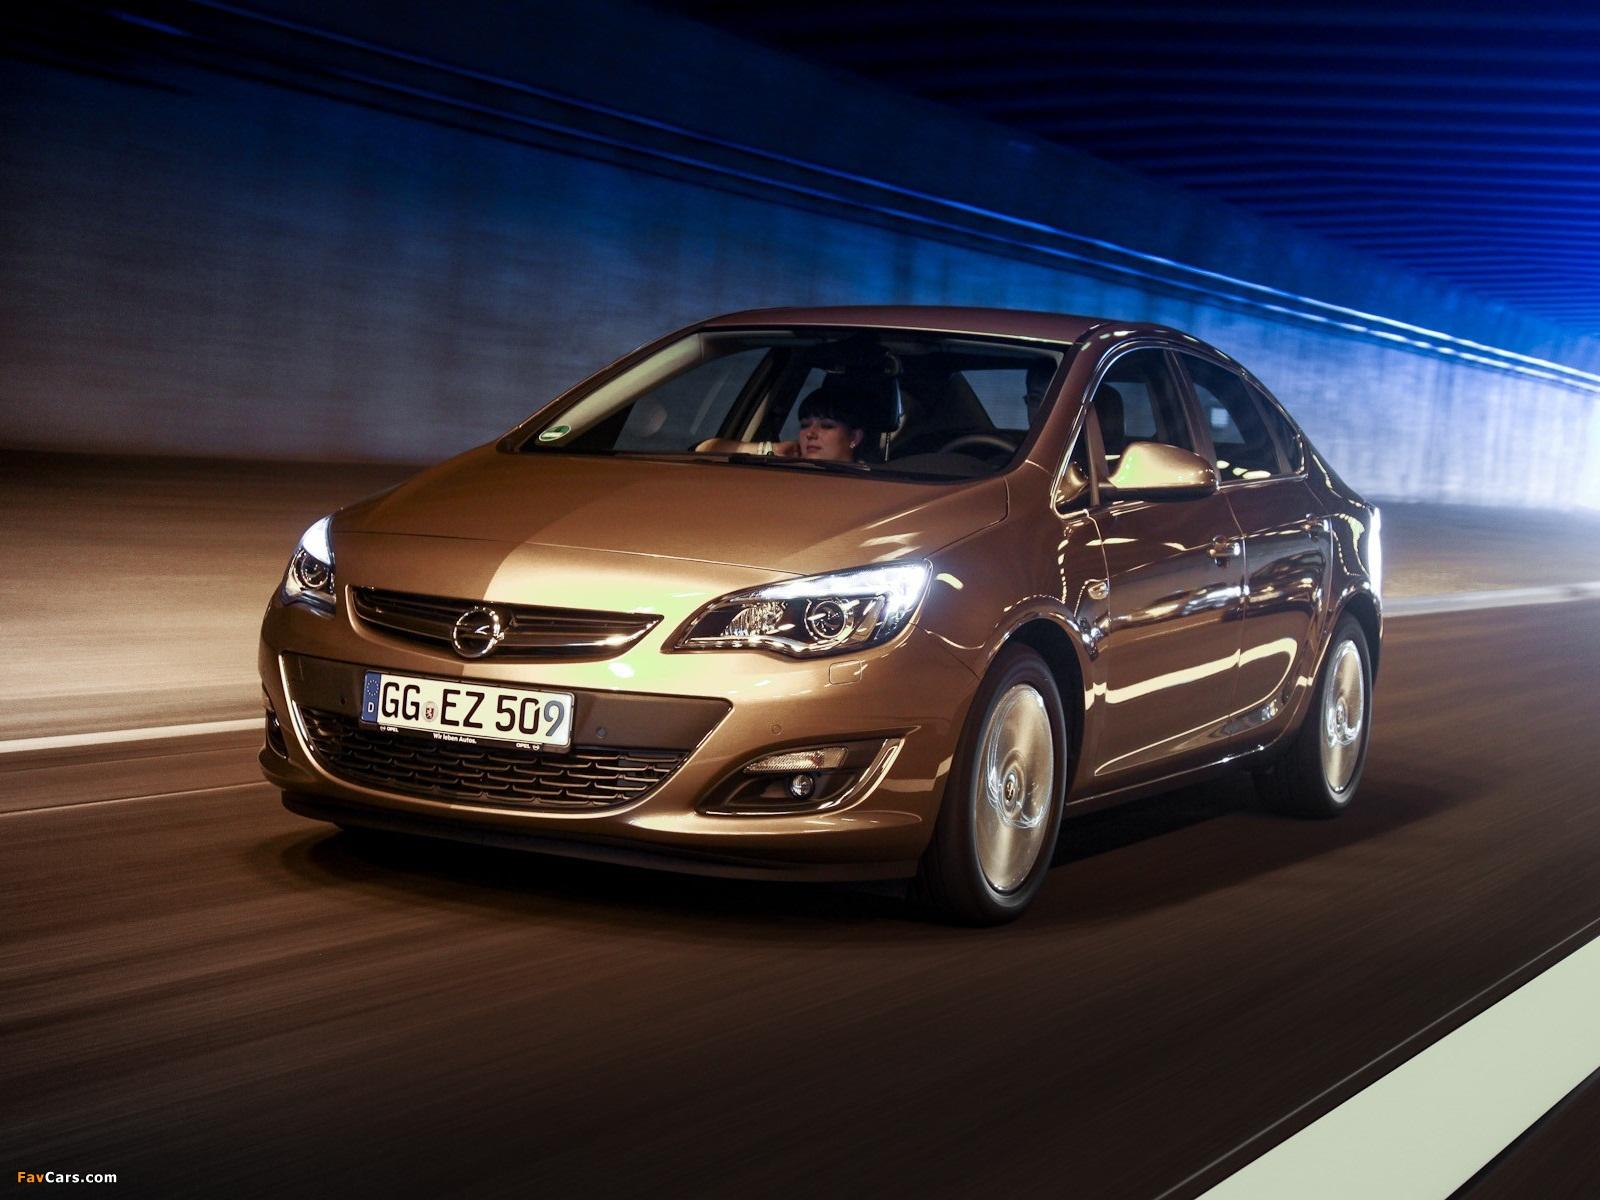 Opel Astra Sedan (J) 2012 pictures (1600 x 1200)